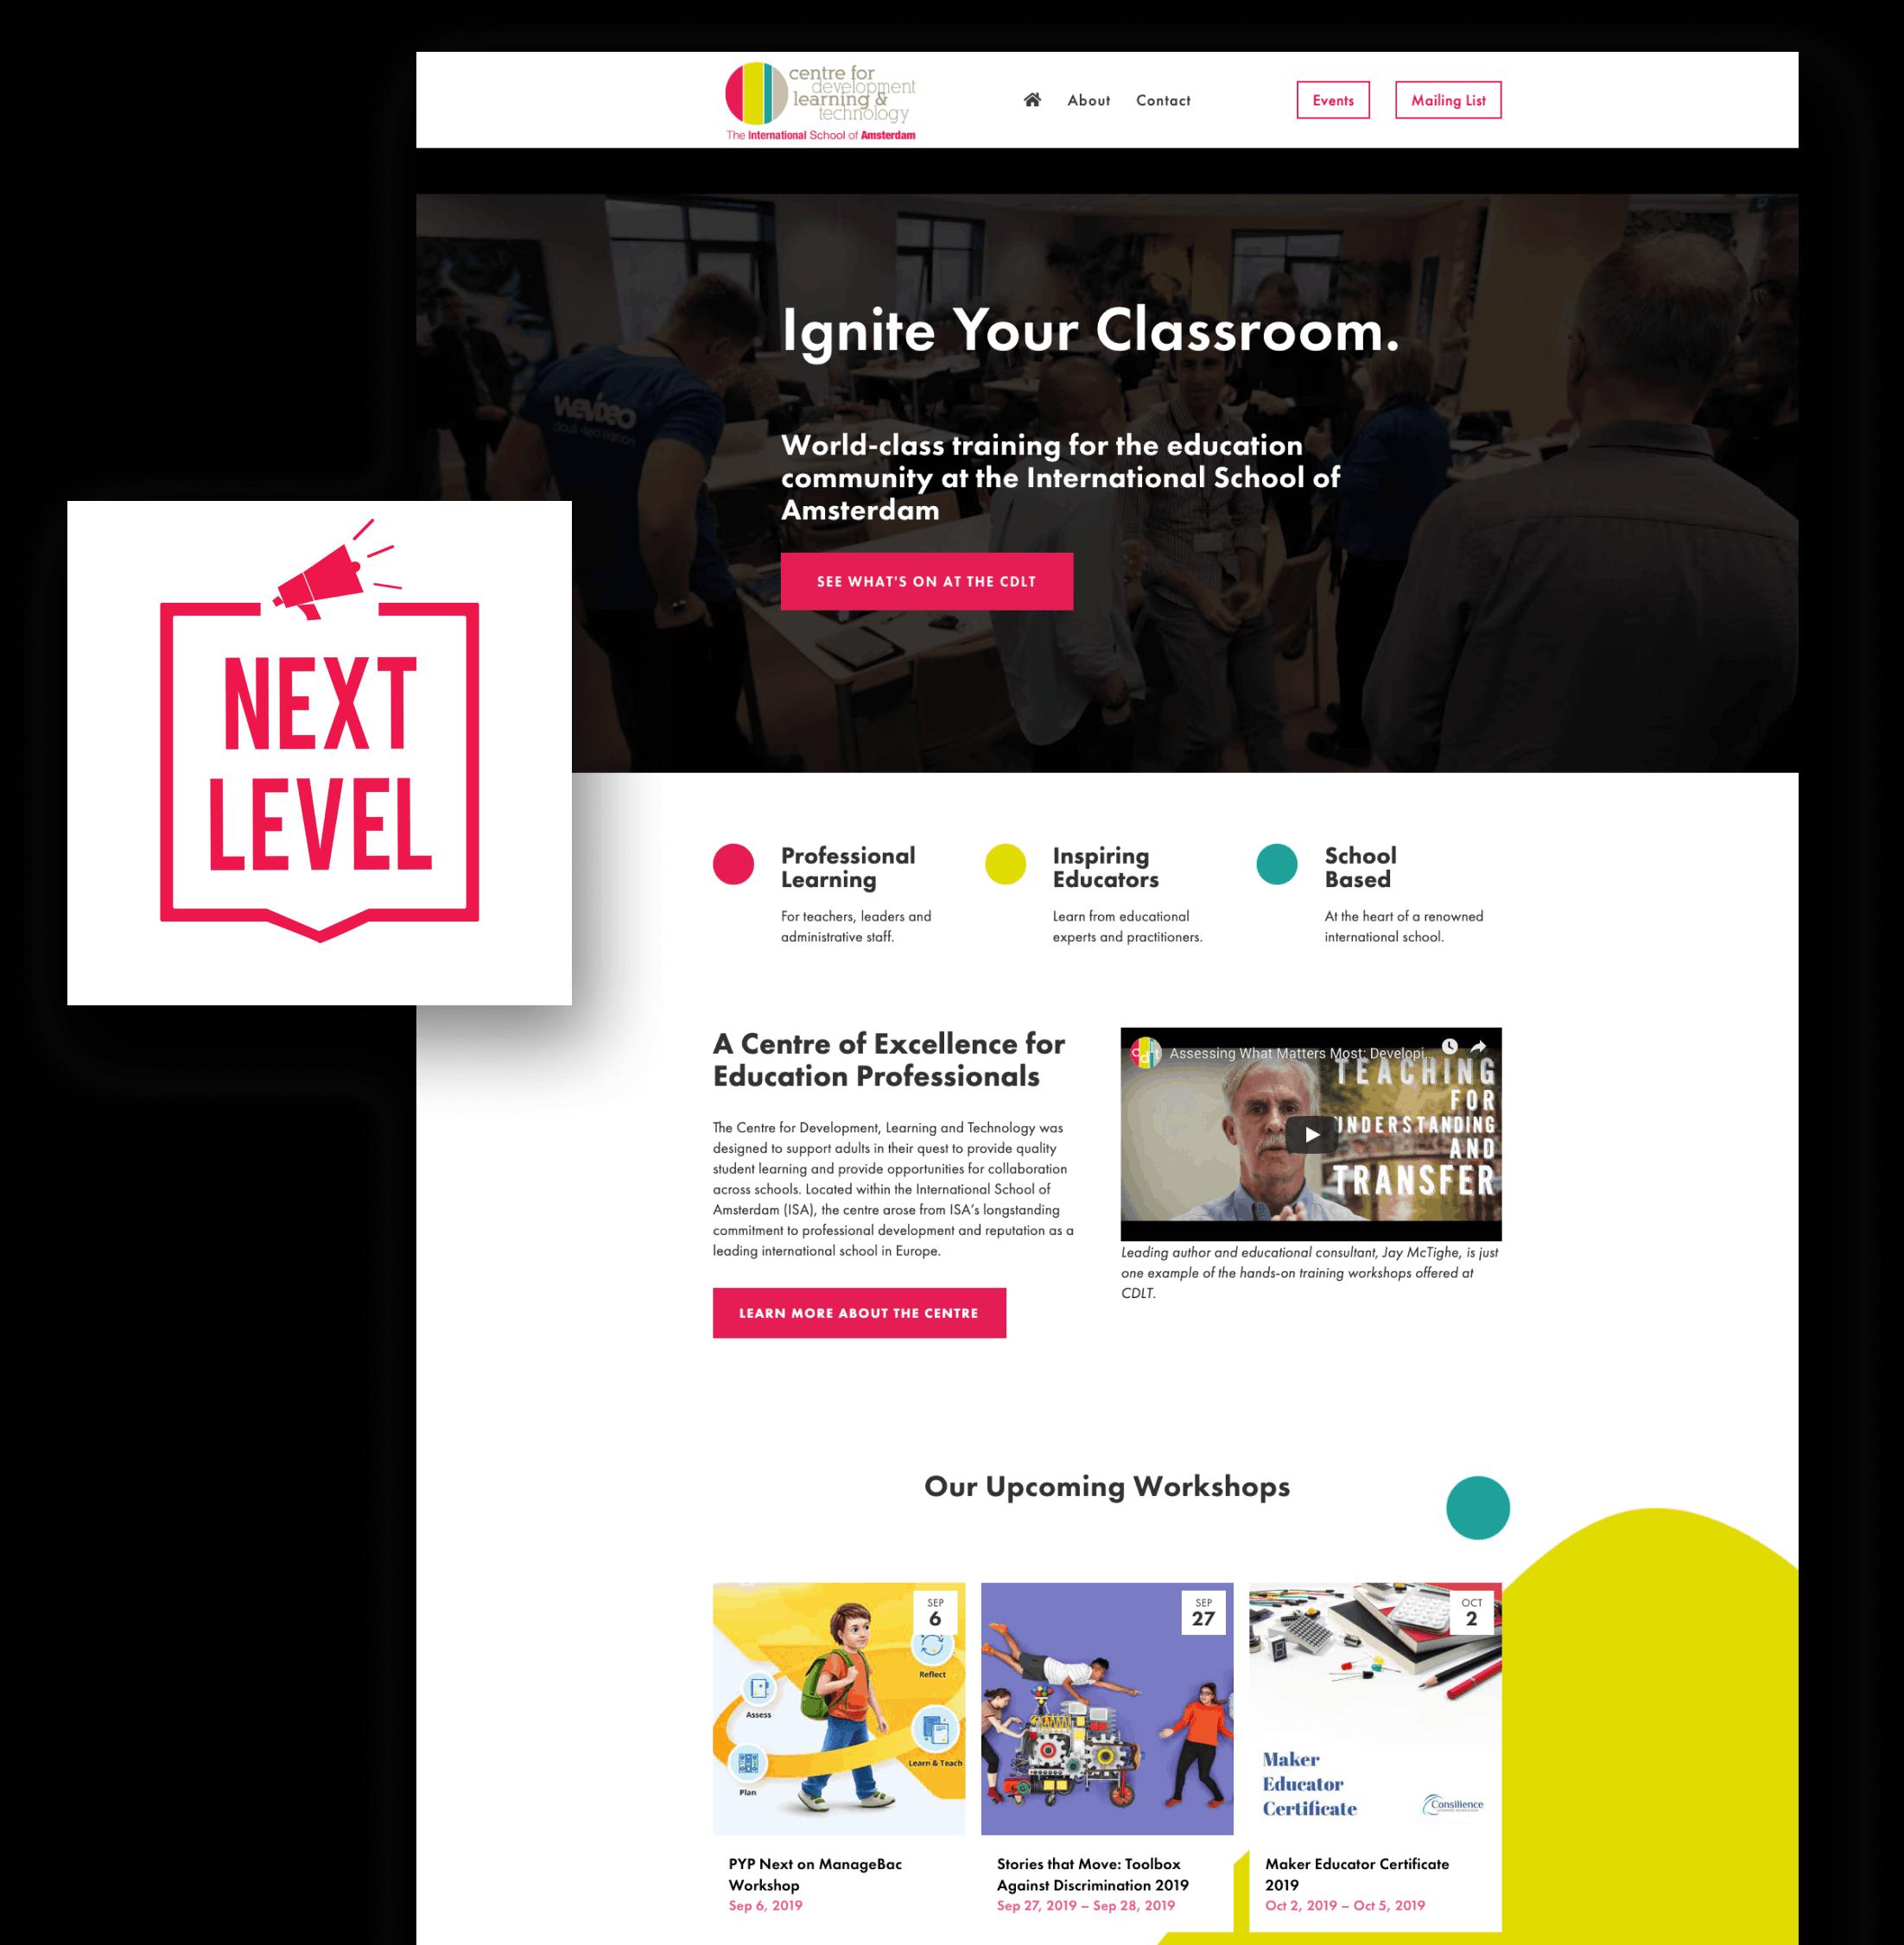 international school conference web design screenshots